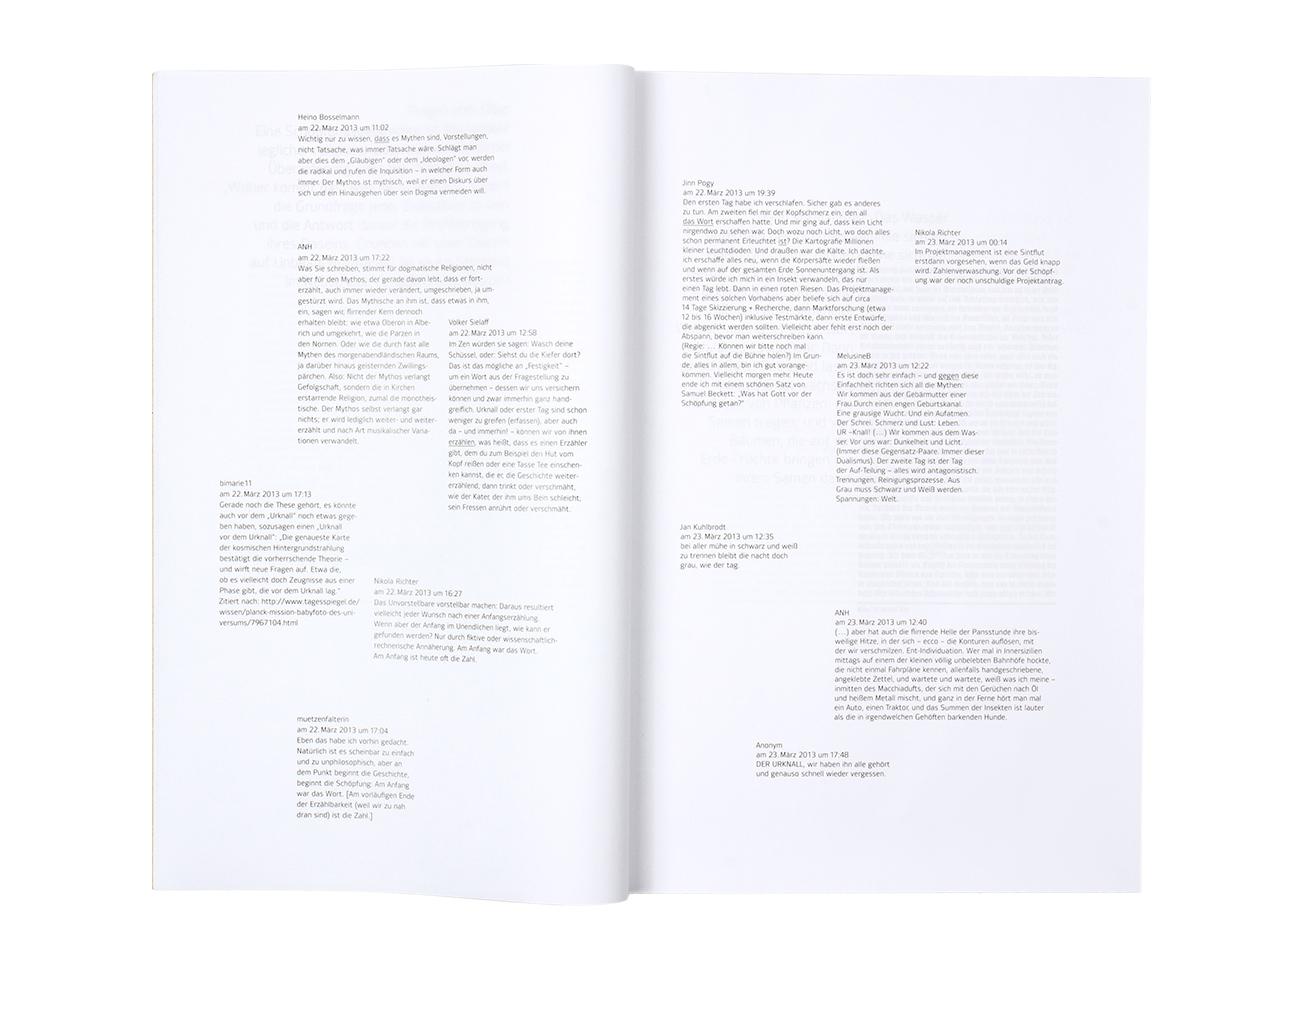 Das Elster Experiment Genesis Bibel E-book Buchgestaltung editorial design Typographie